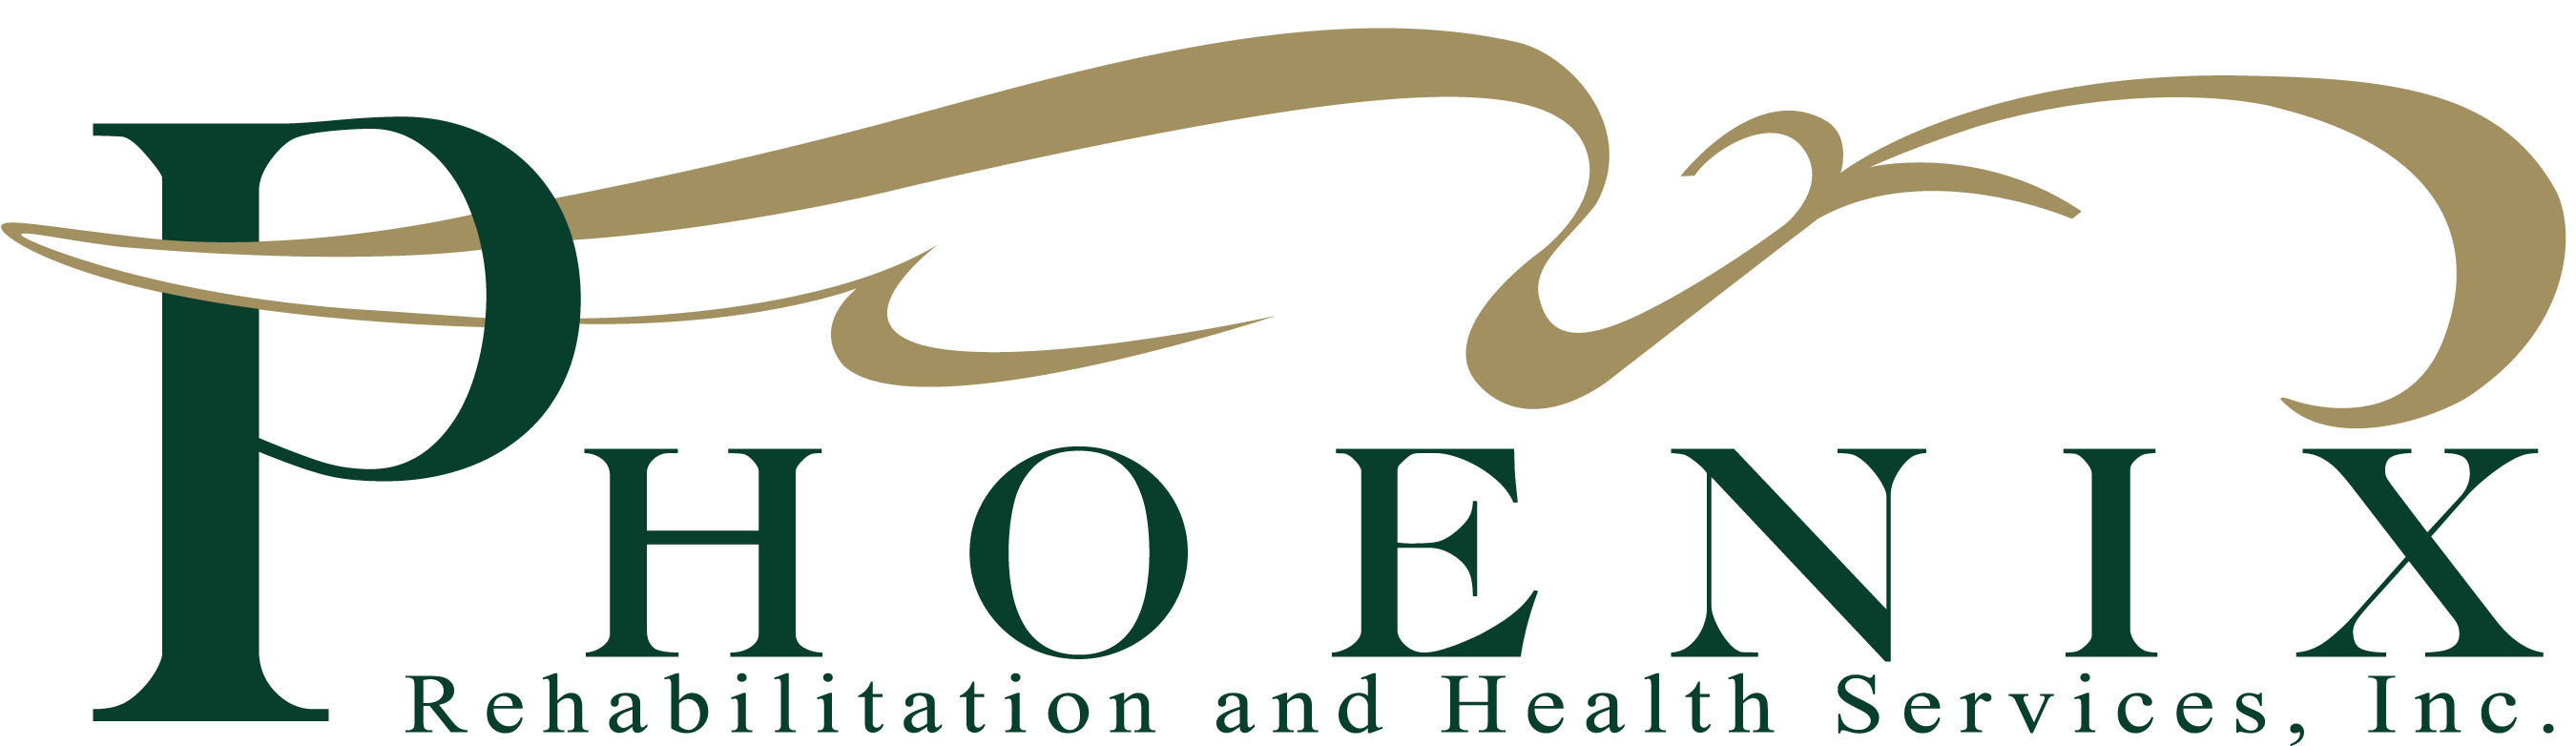 PHOENIX Rehabilitation and Health Services, Inc. (PRNewsFoto/PHOENIX Rehabilitation...)